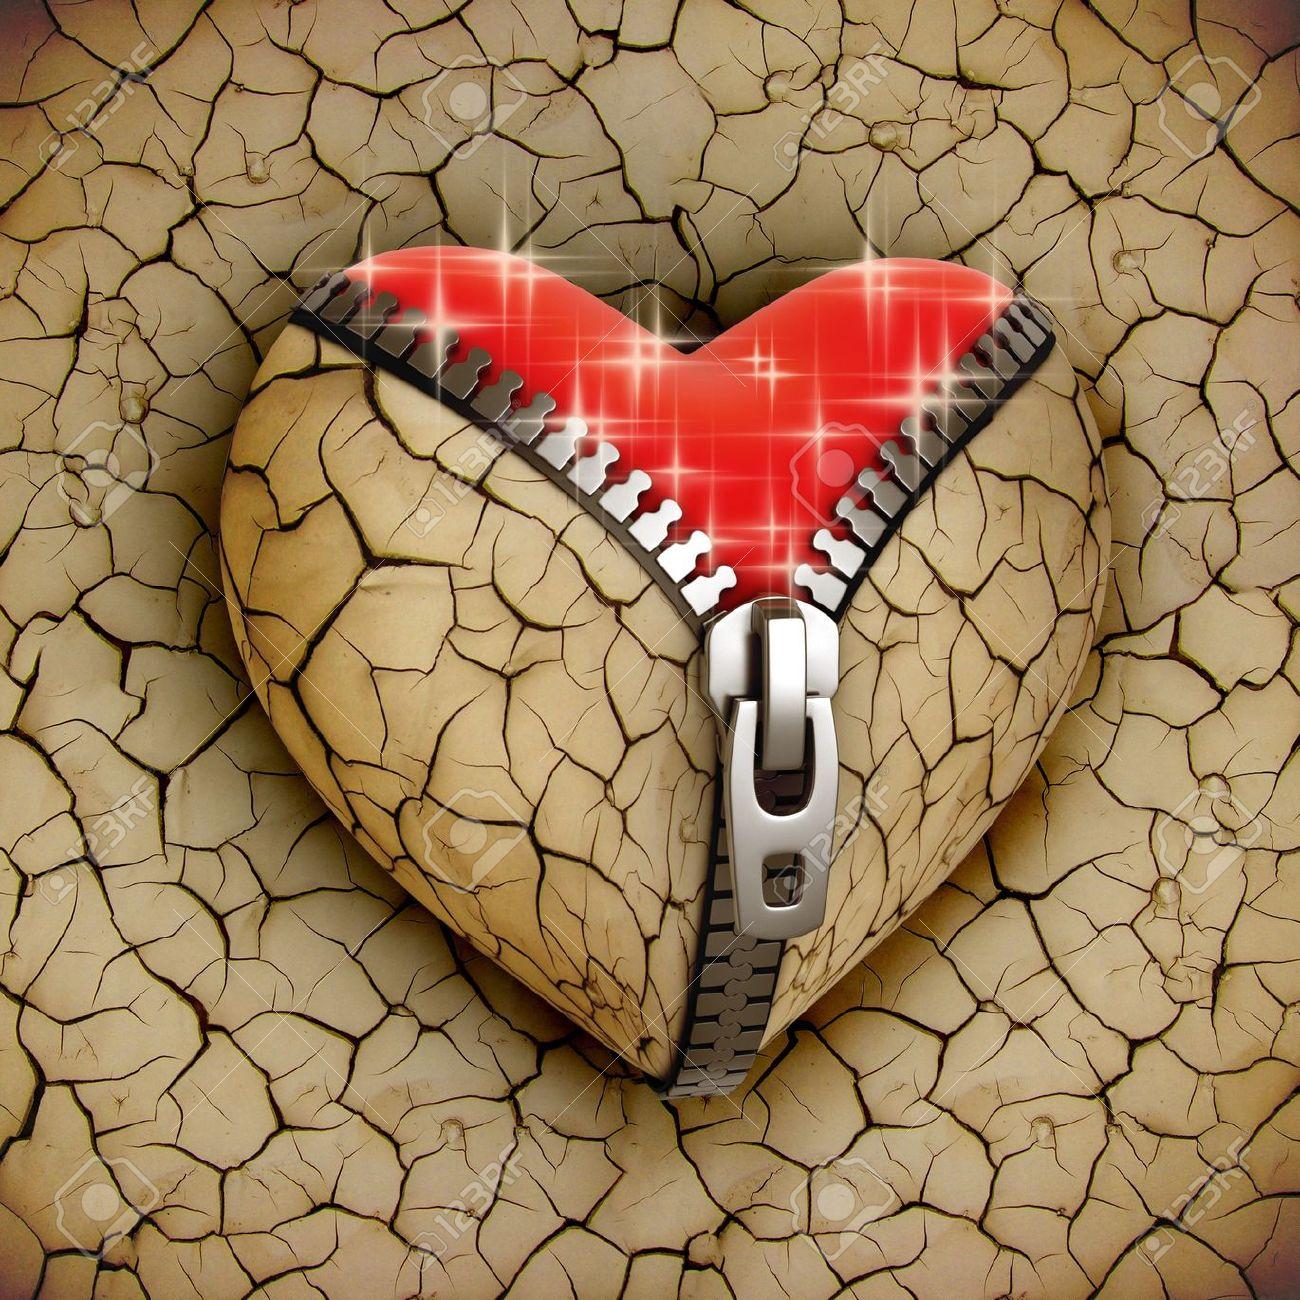 New Love 3d Concept New Shiny Heart Under Broken One Stock Photo